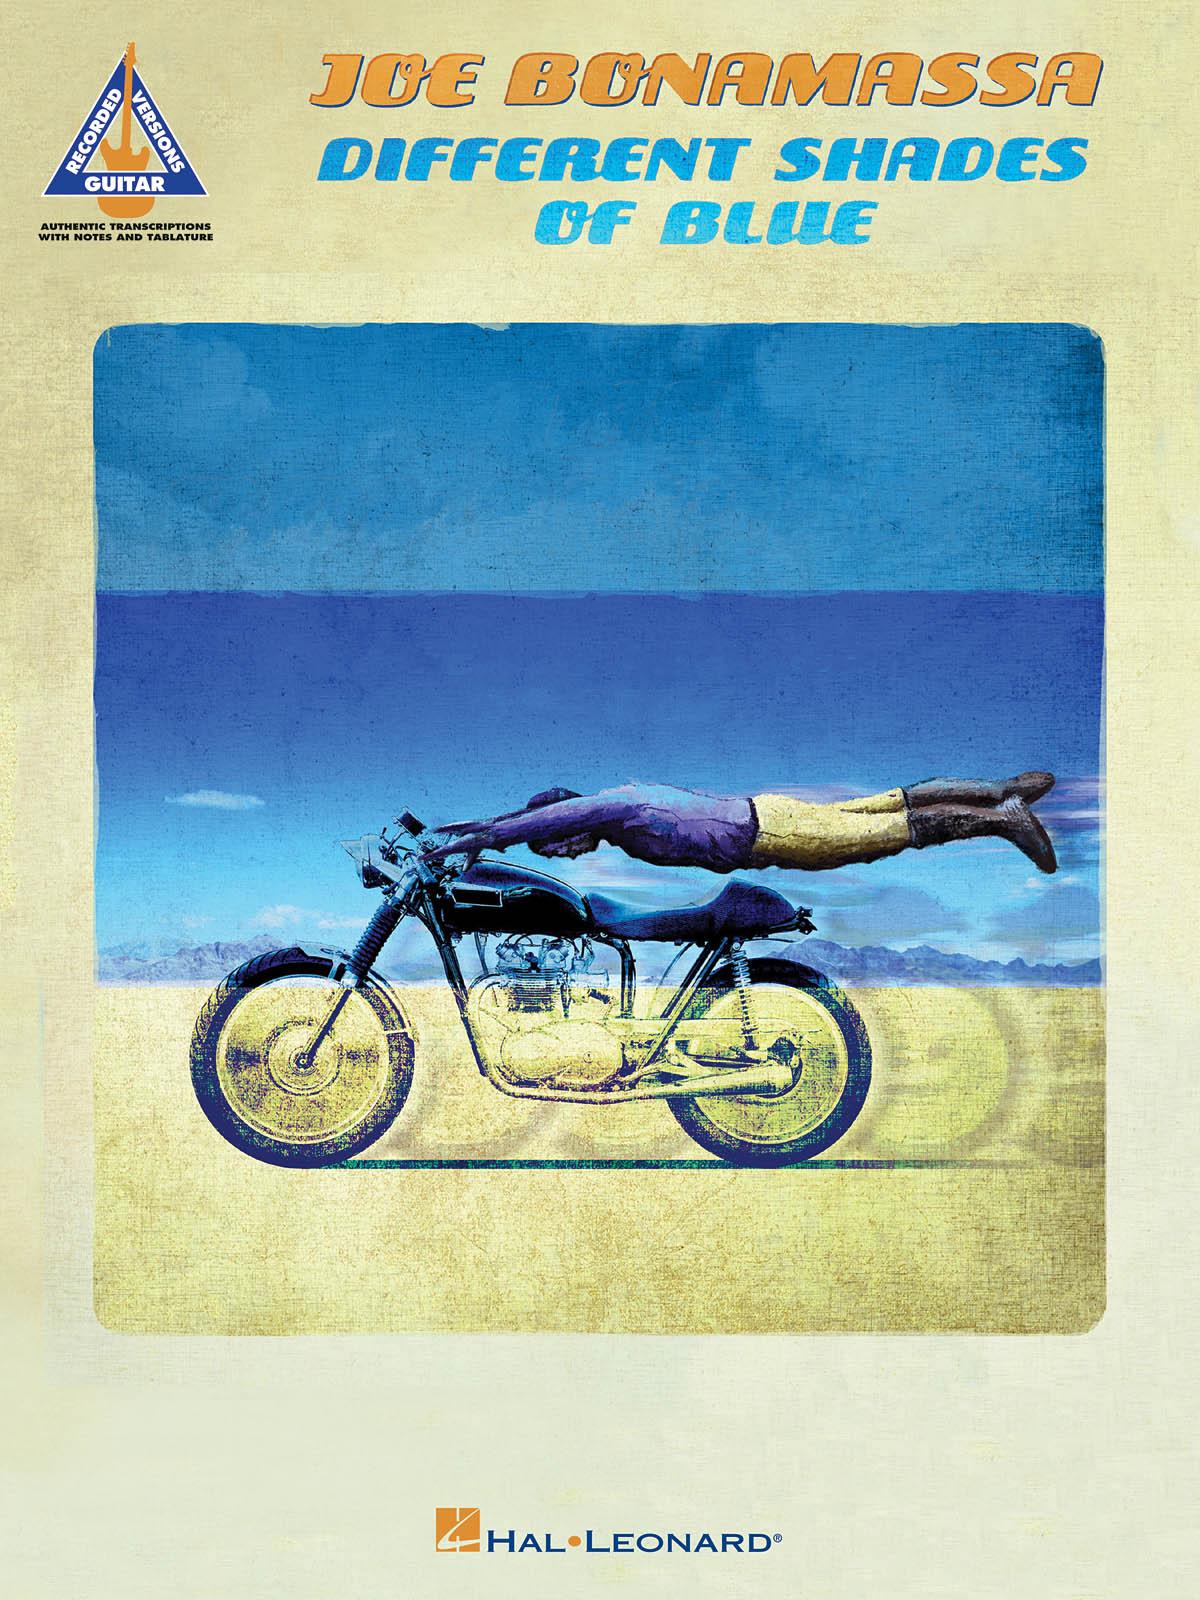 Joe Bonamassa: Joe Bonamassa - Different Shades of Blue: Guitar Solo: Album